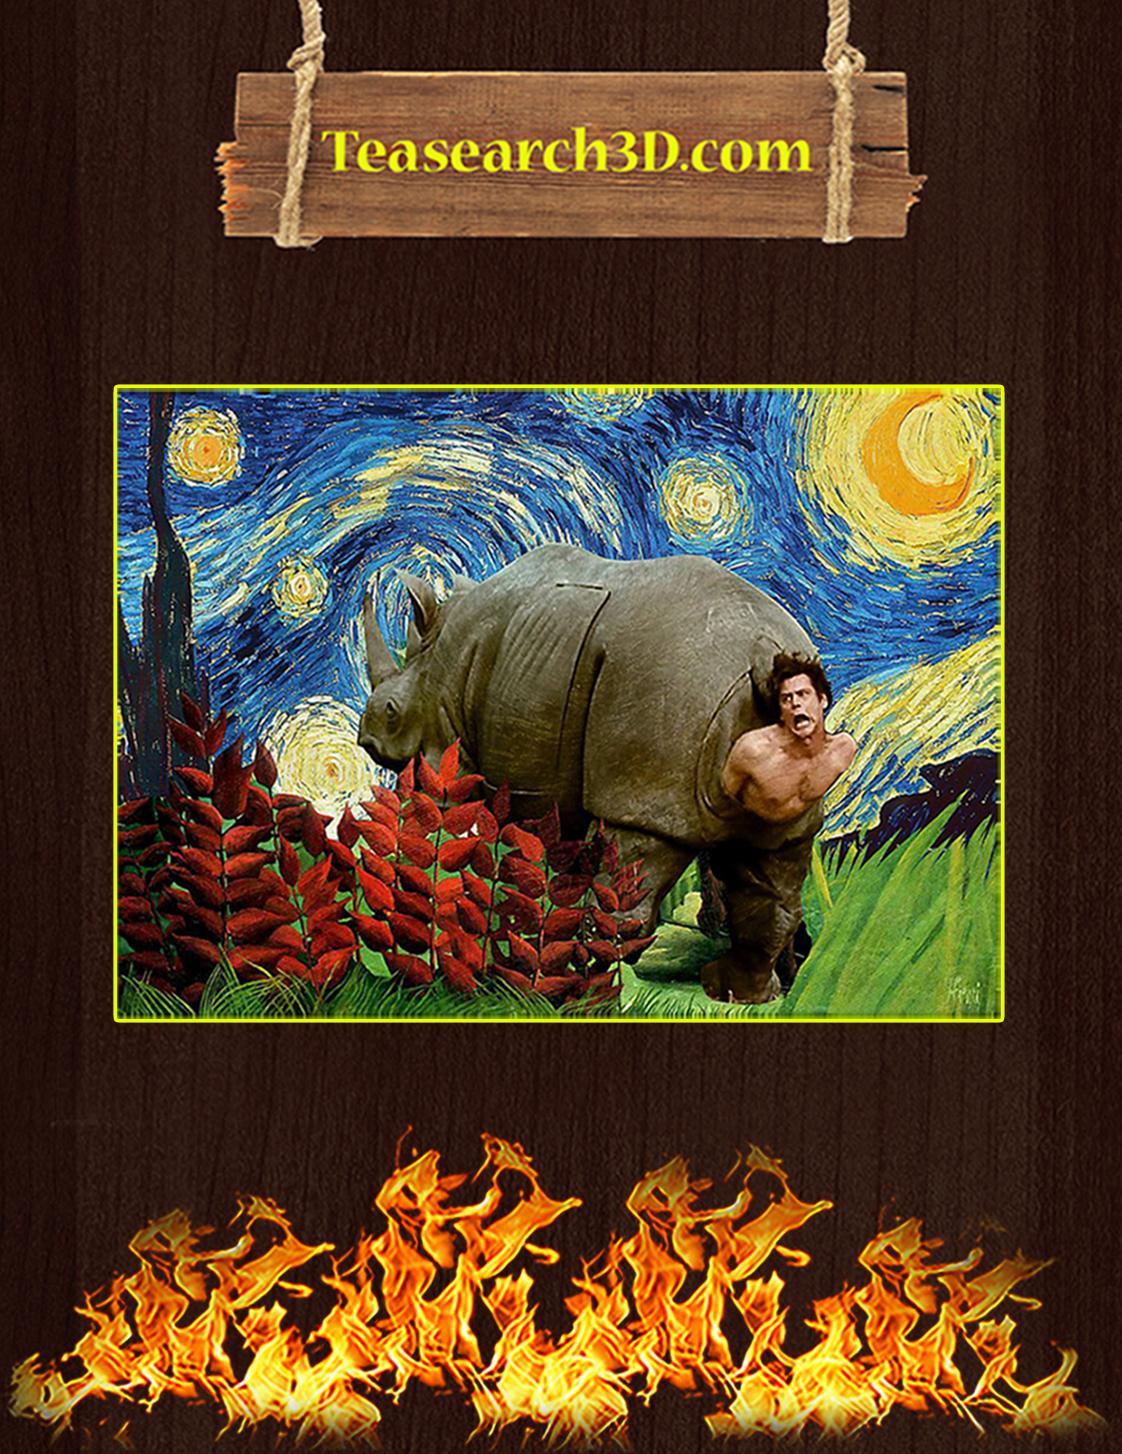 Rhino scene ace ventura starry night poster A3